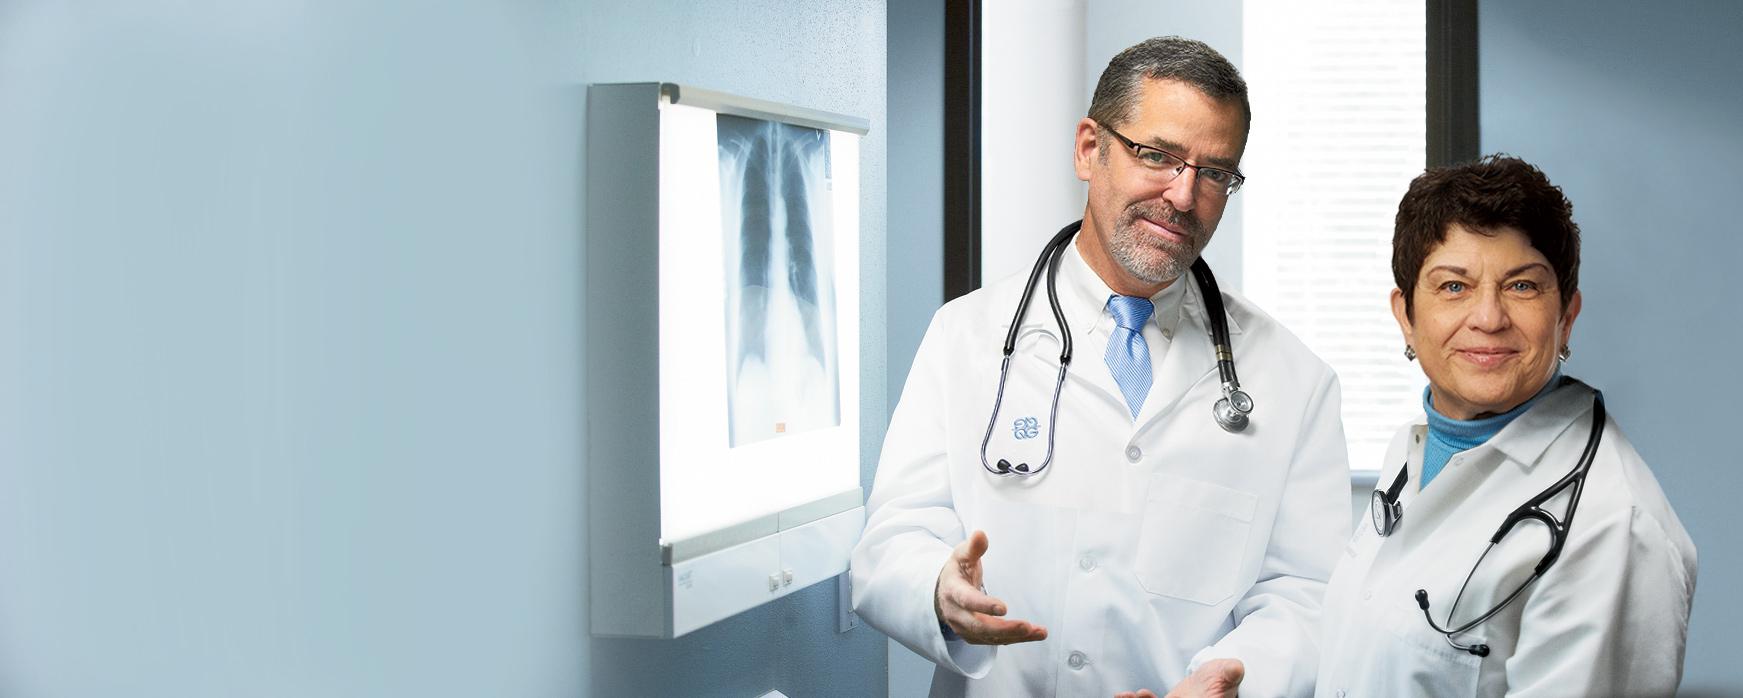 Doctors looking at radiology x-ray